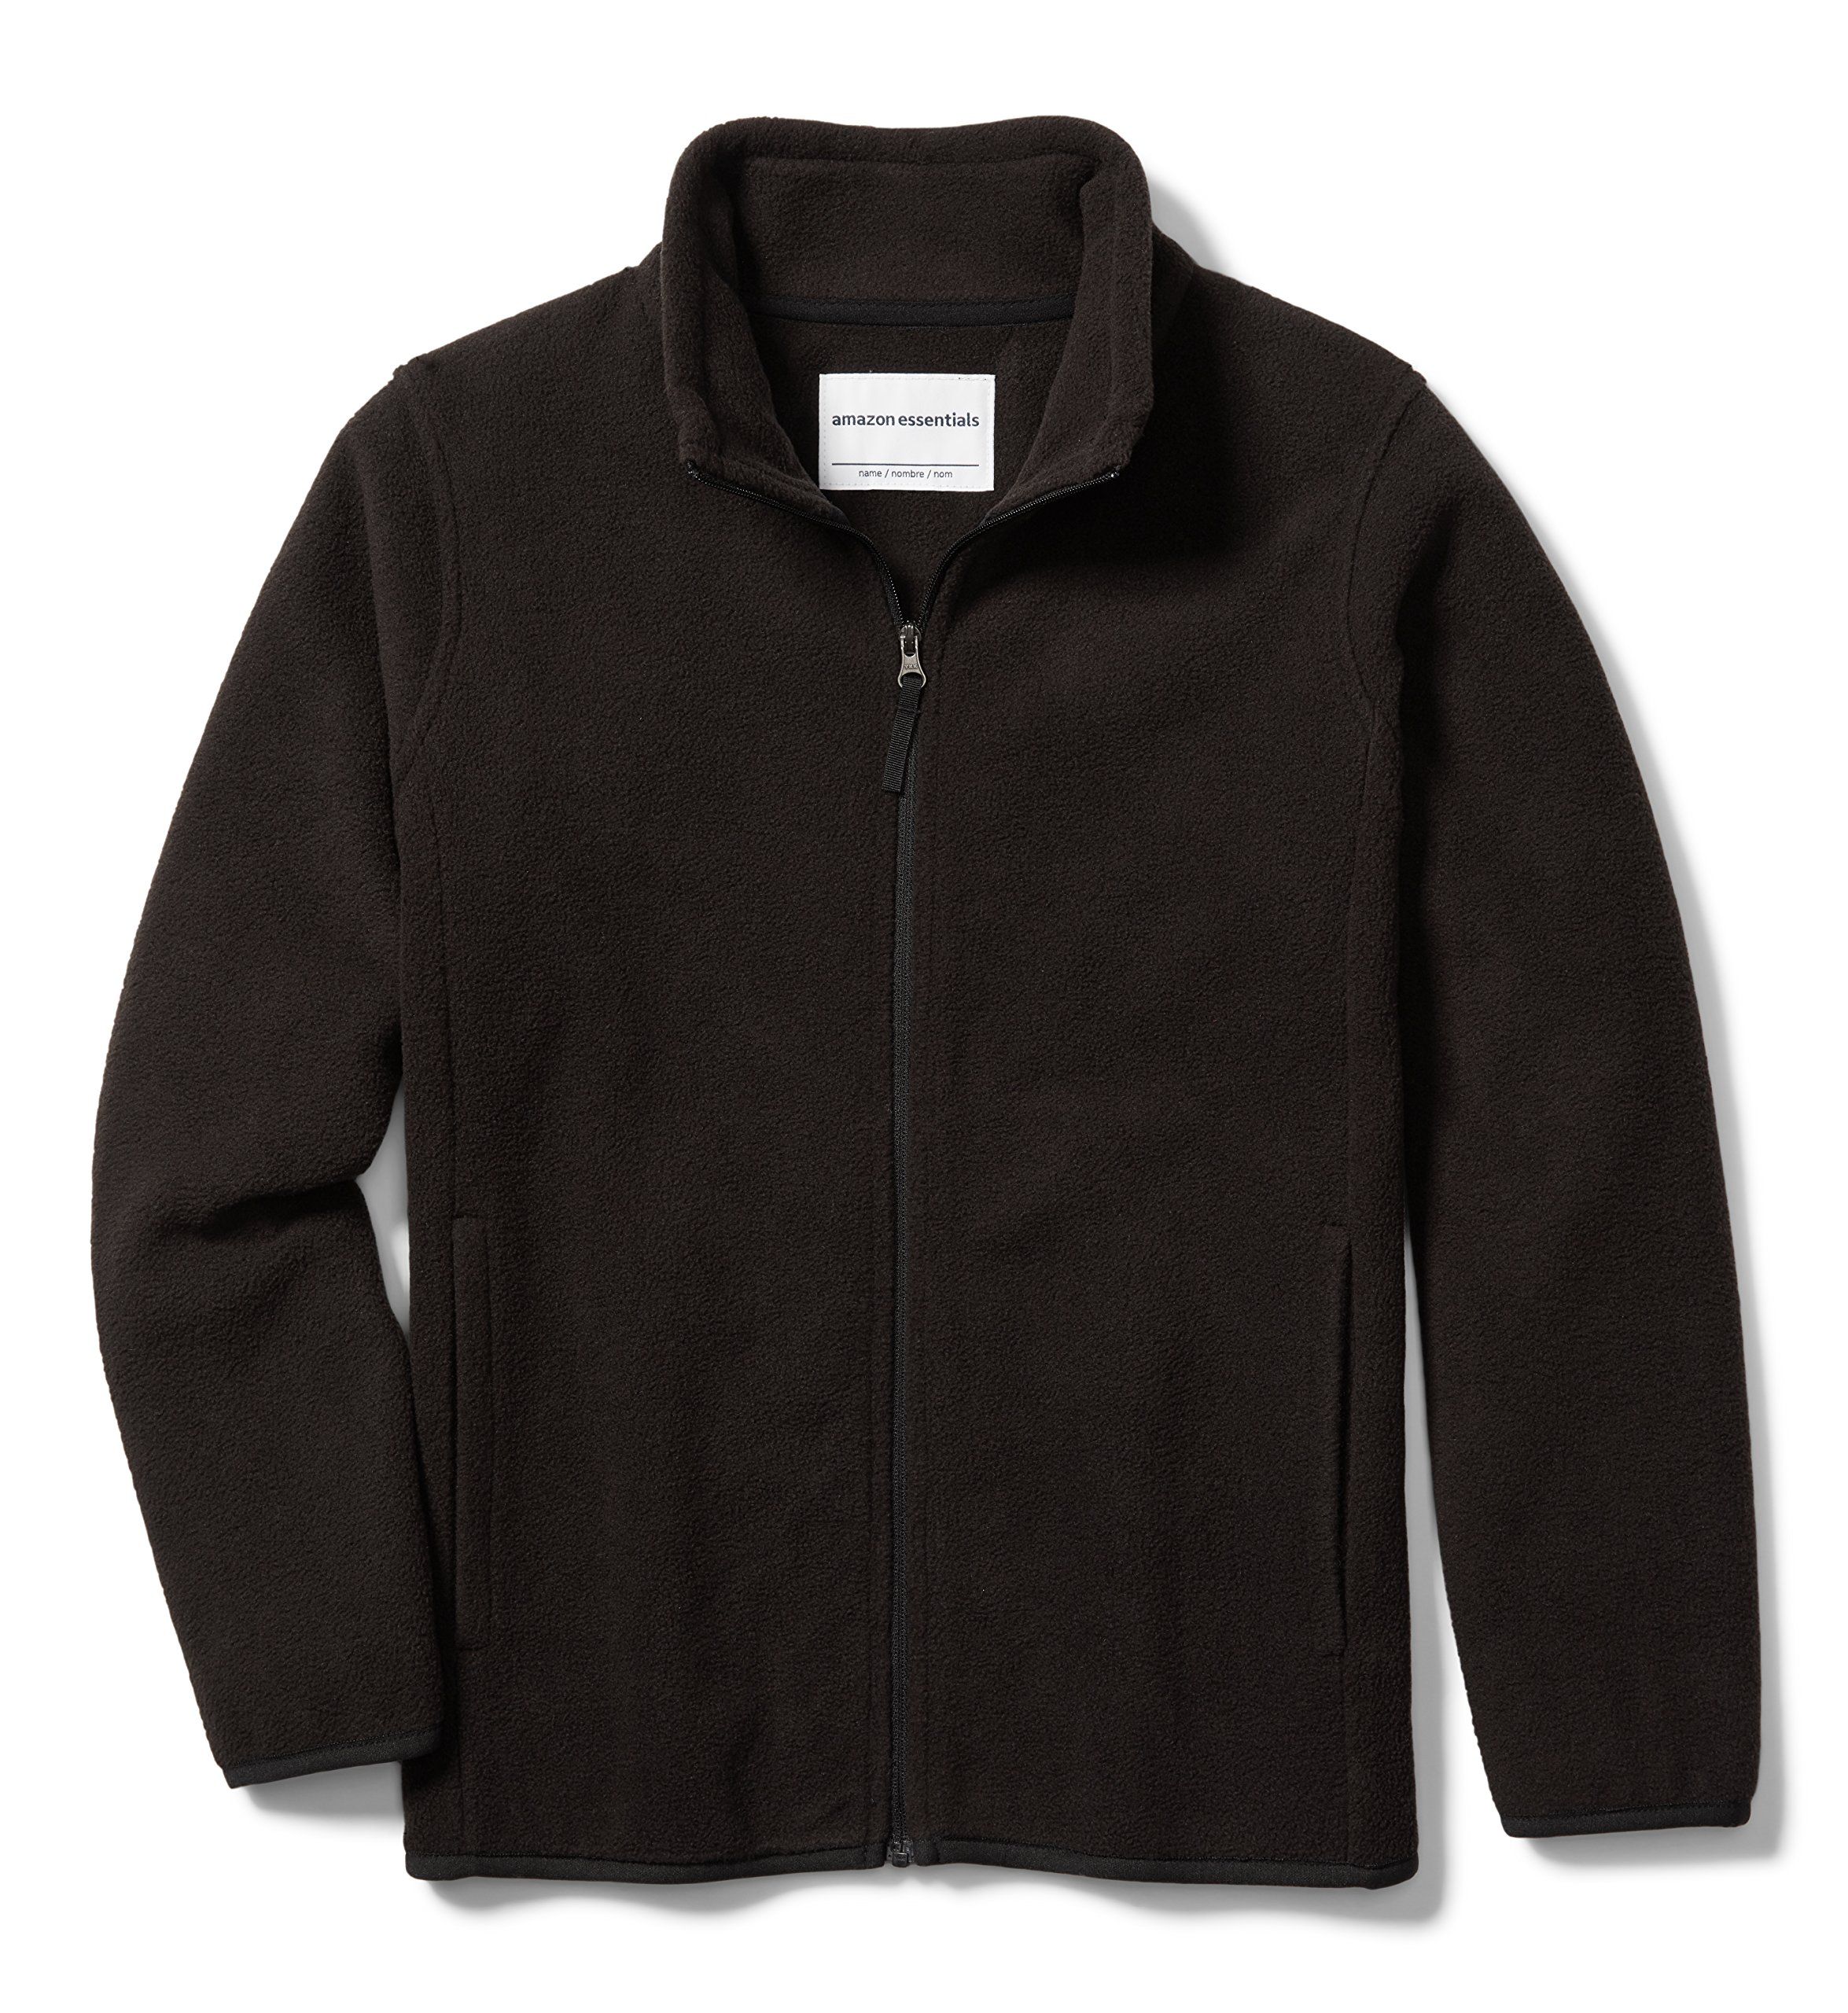 Amazon Essentials Big Boys' Full-Zip Polar Fleece Jacket, Black, Large by Amazon Essentials